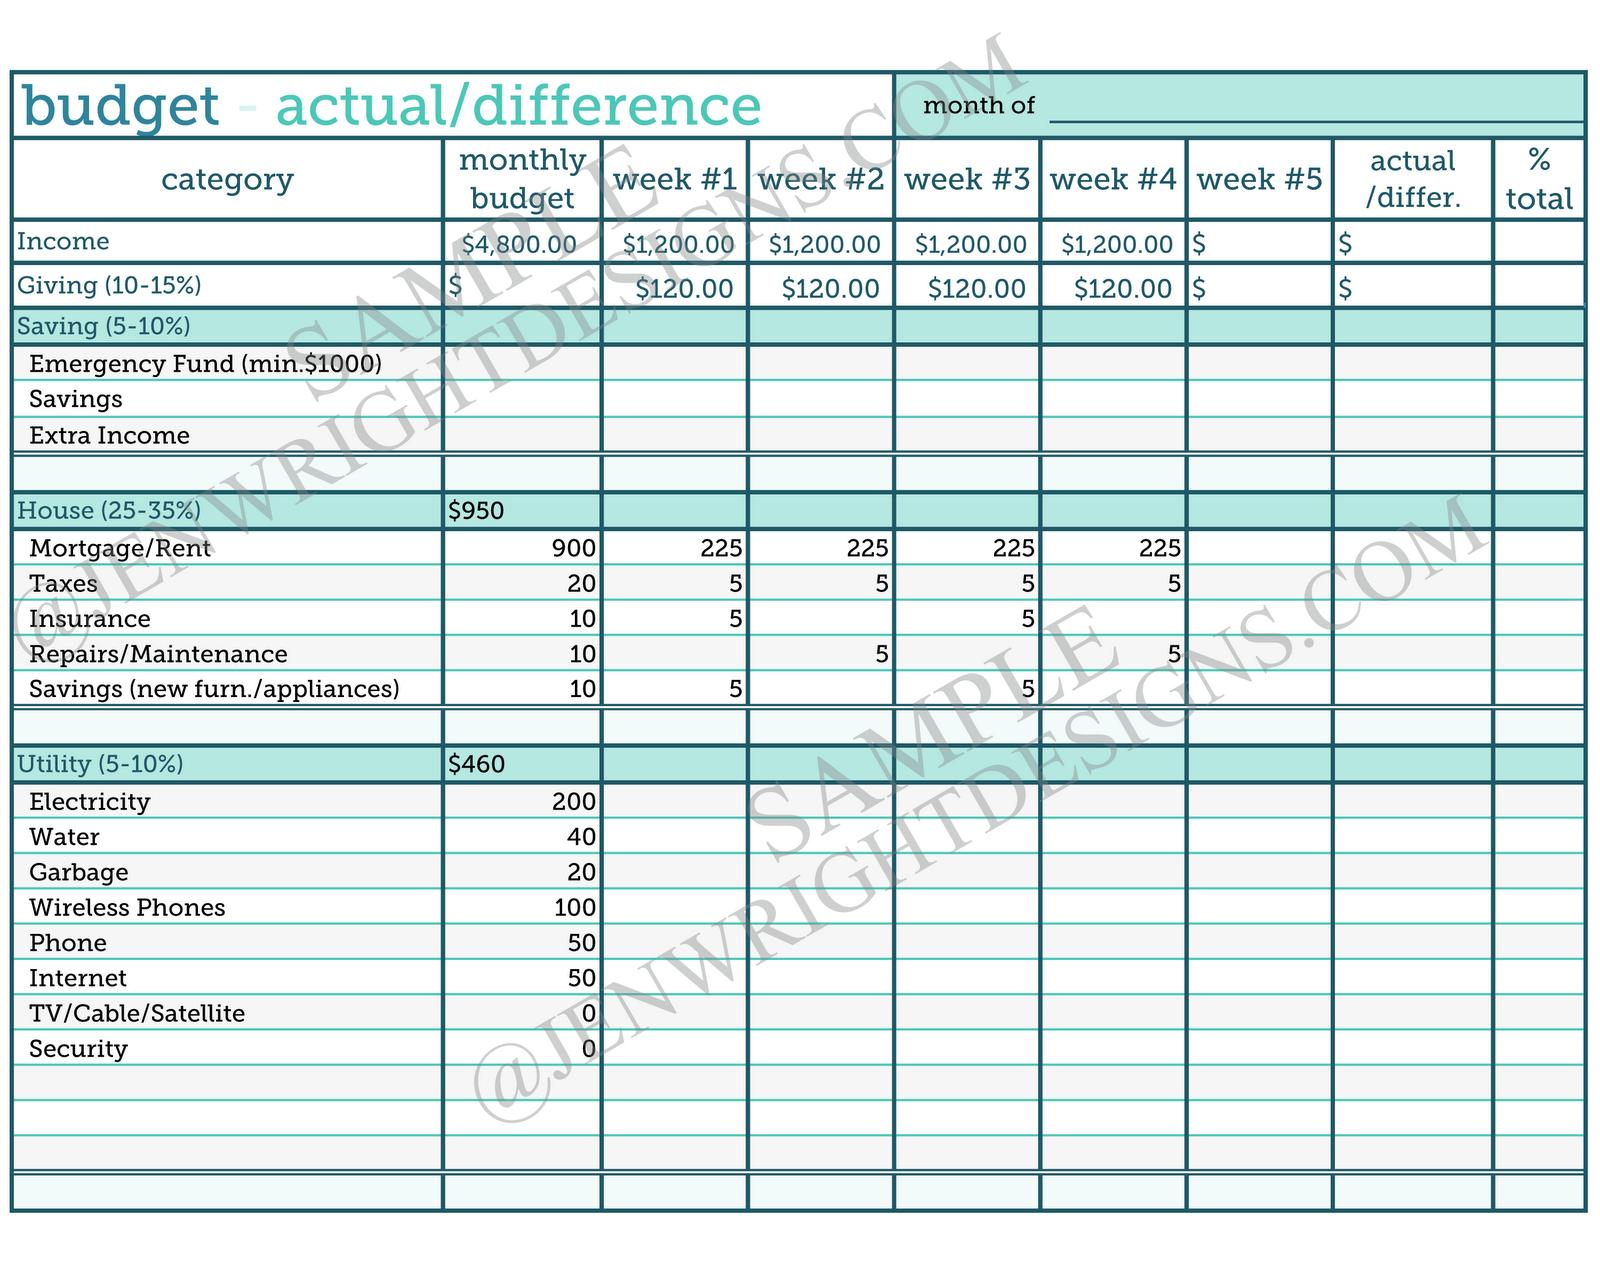 worksheet Free Home Budget Worksheet worksheet christian financial budget thedanks get your free beachmonkeys net family